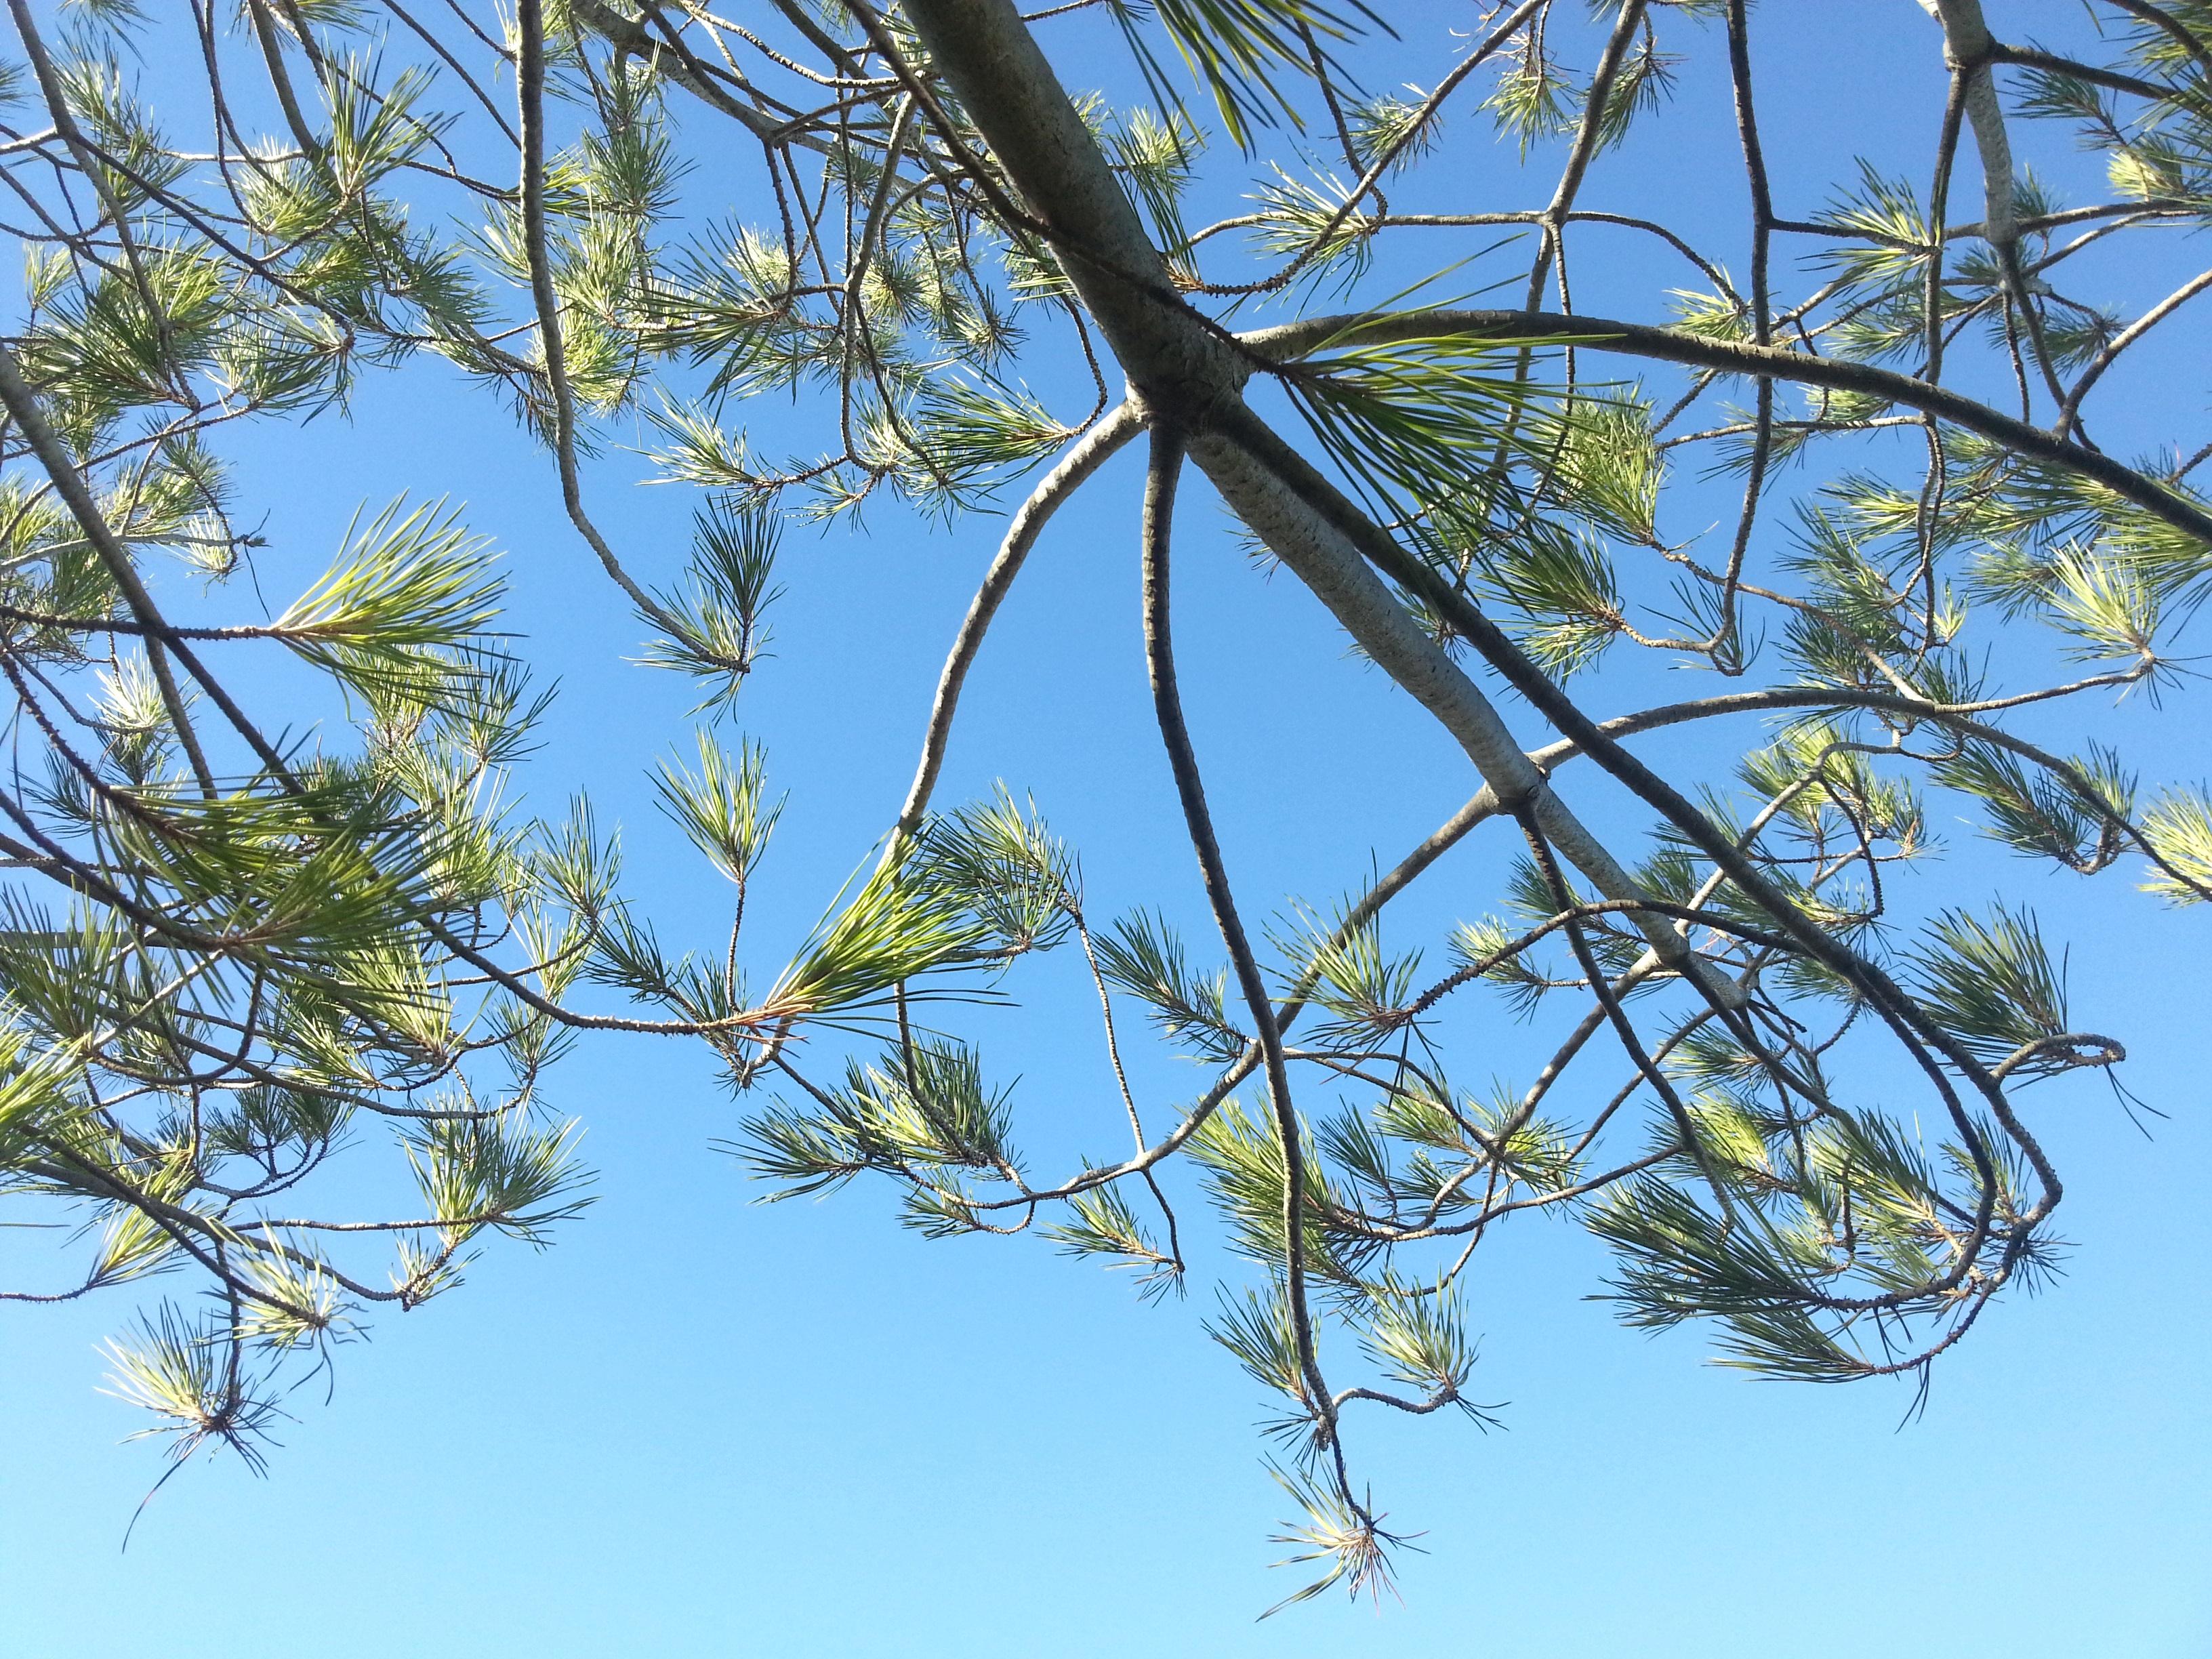 Zarte Pinienzweige gegen hellblauen Himmel